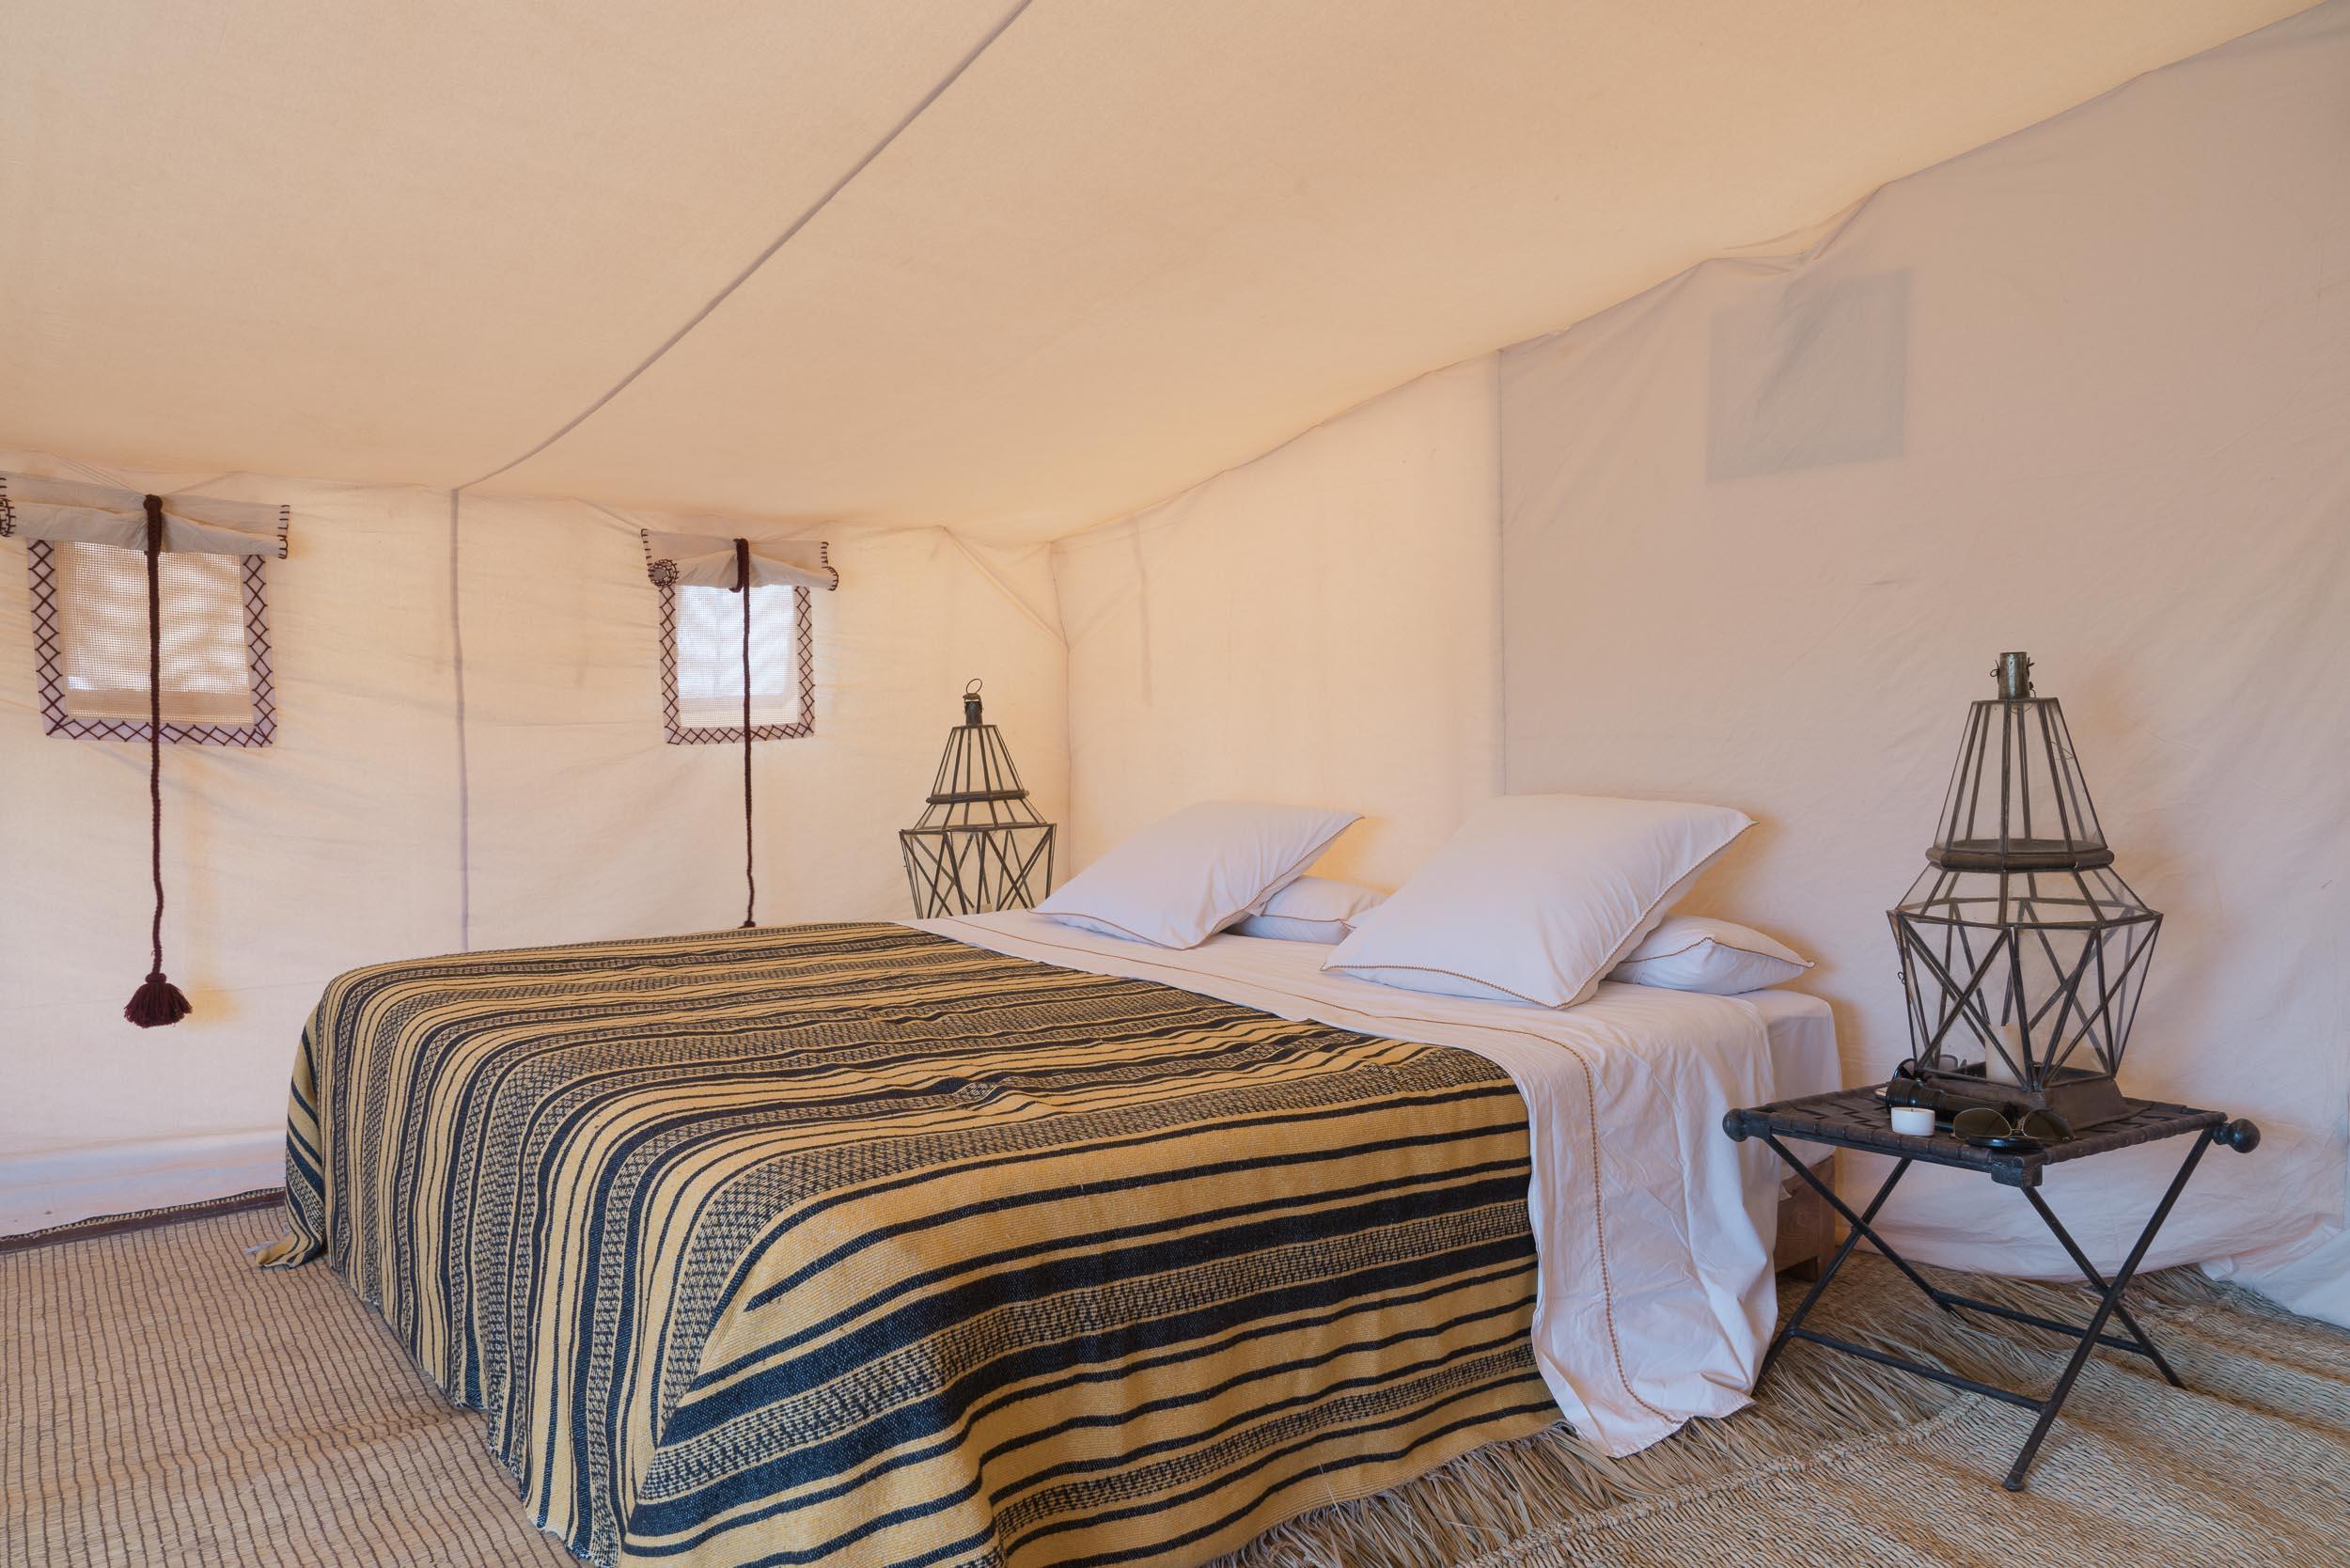 the_getaway_edit_morocco_dar_ahlam_sahara_desert-17.jpg